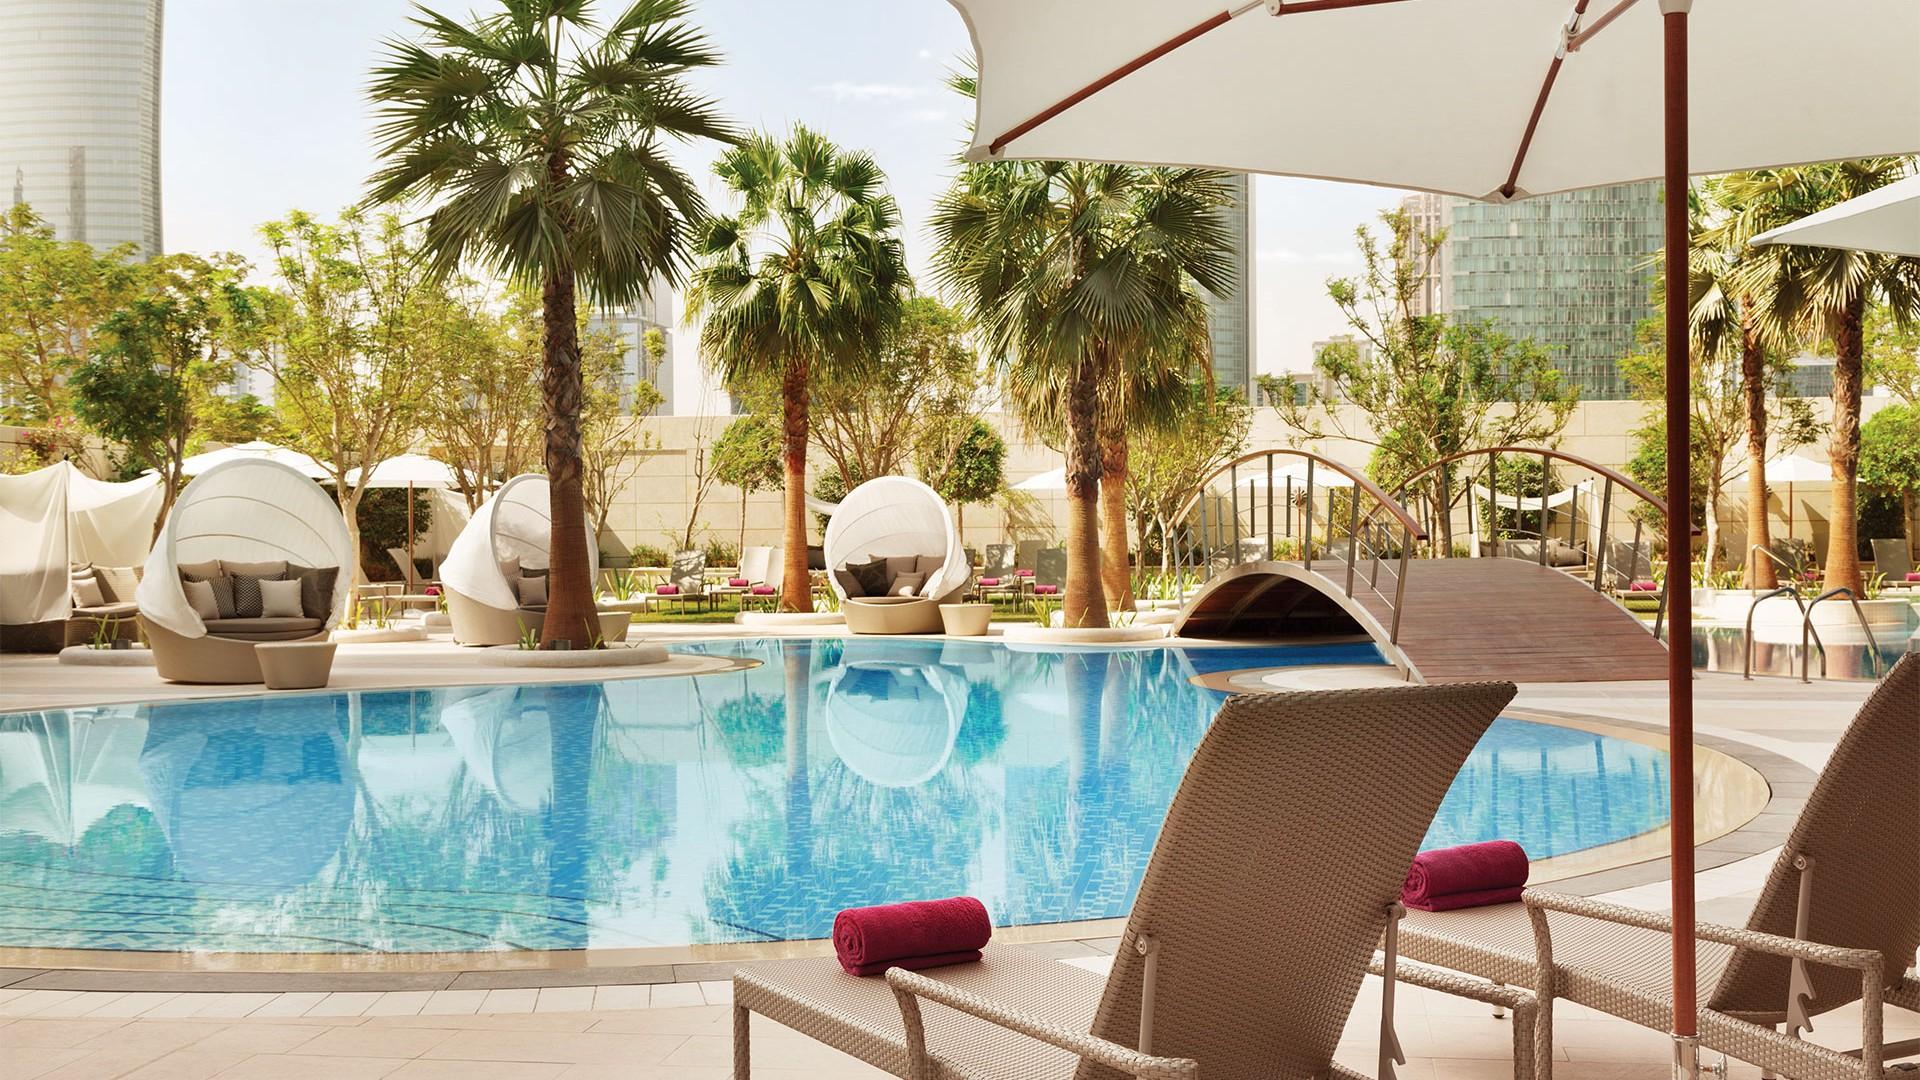 Shangri-La pool in Doha